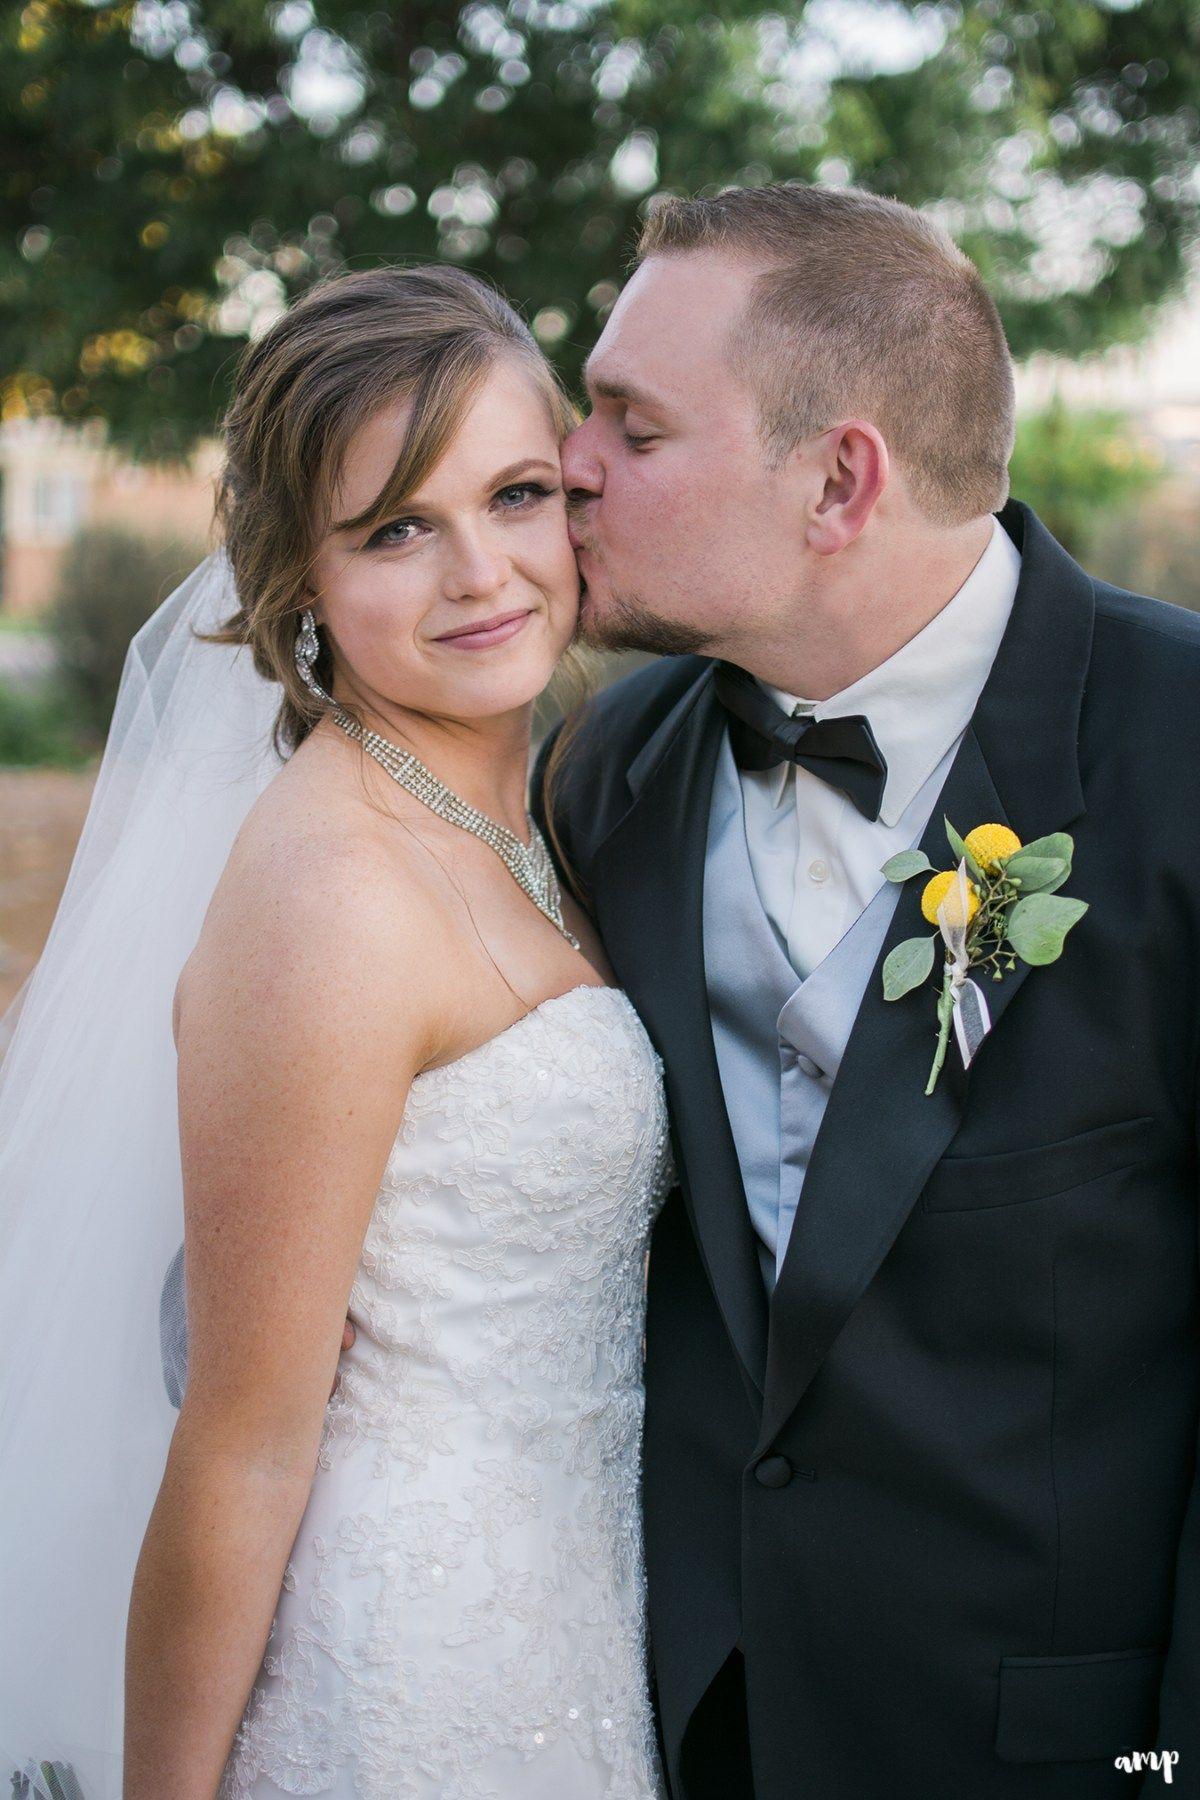 Best Summer Wedding Photos You Must Have Grand Junction By Amanda Matilda